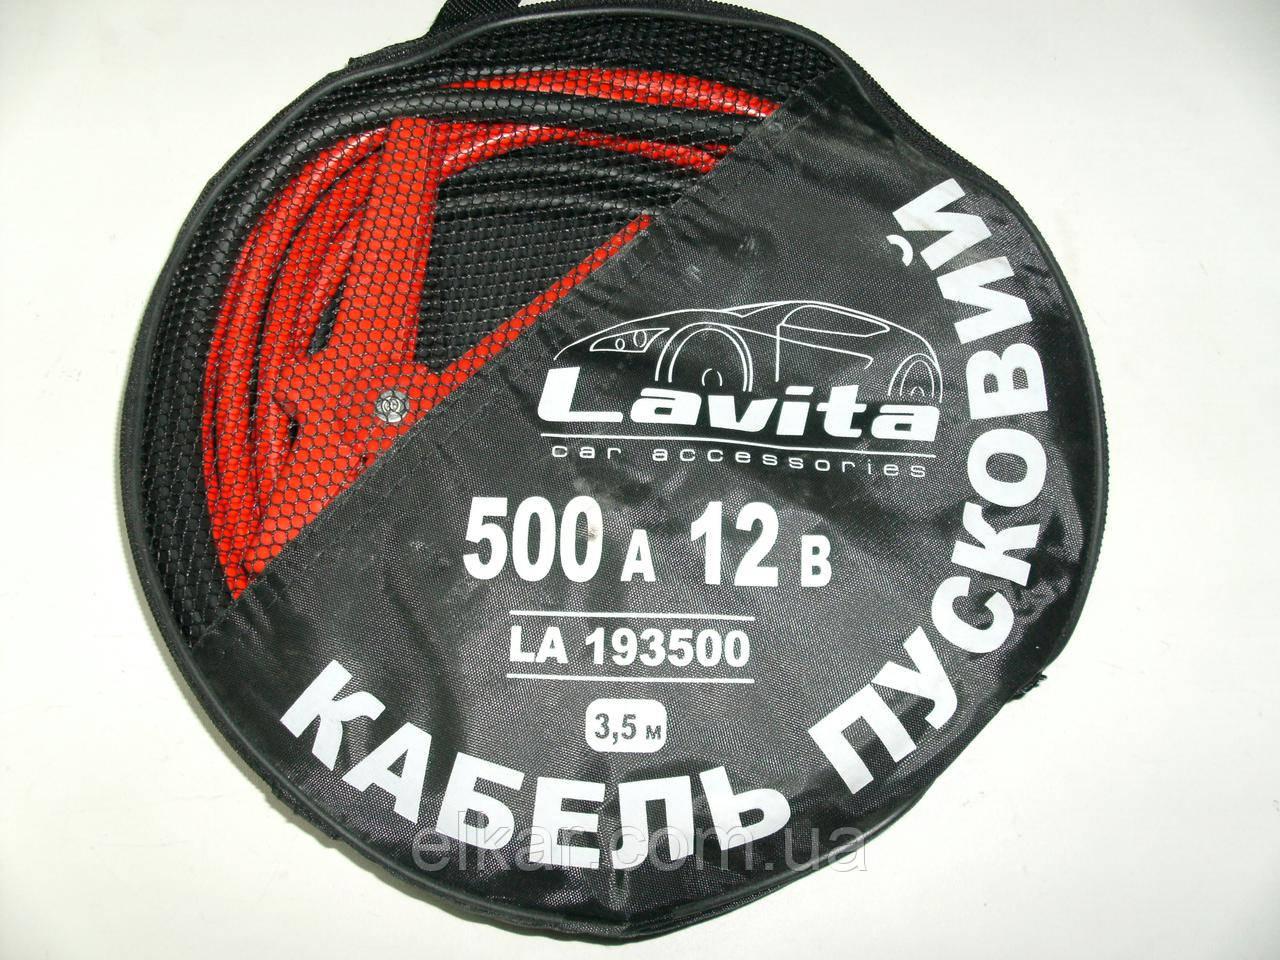 Прикурювач 500 А LA 193500 (LAVITA) (Туреччина)